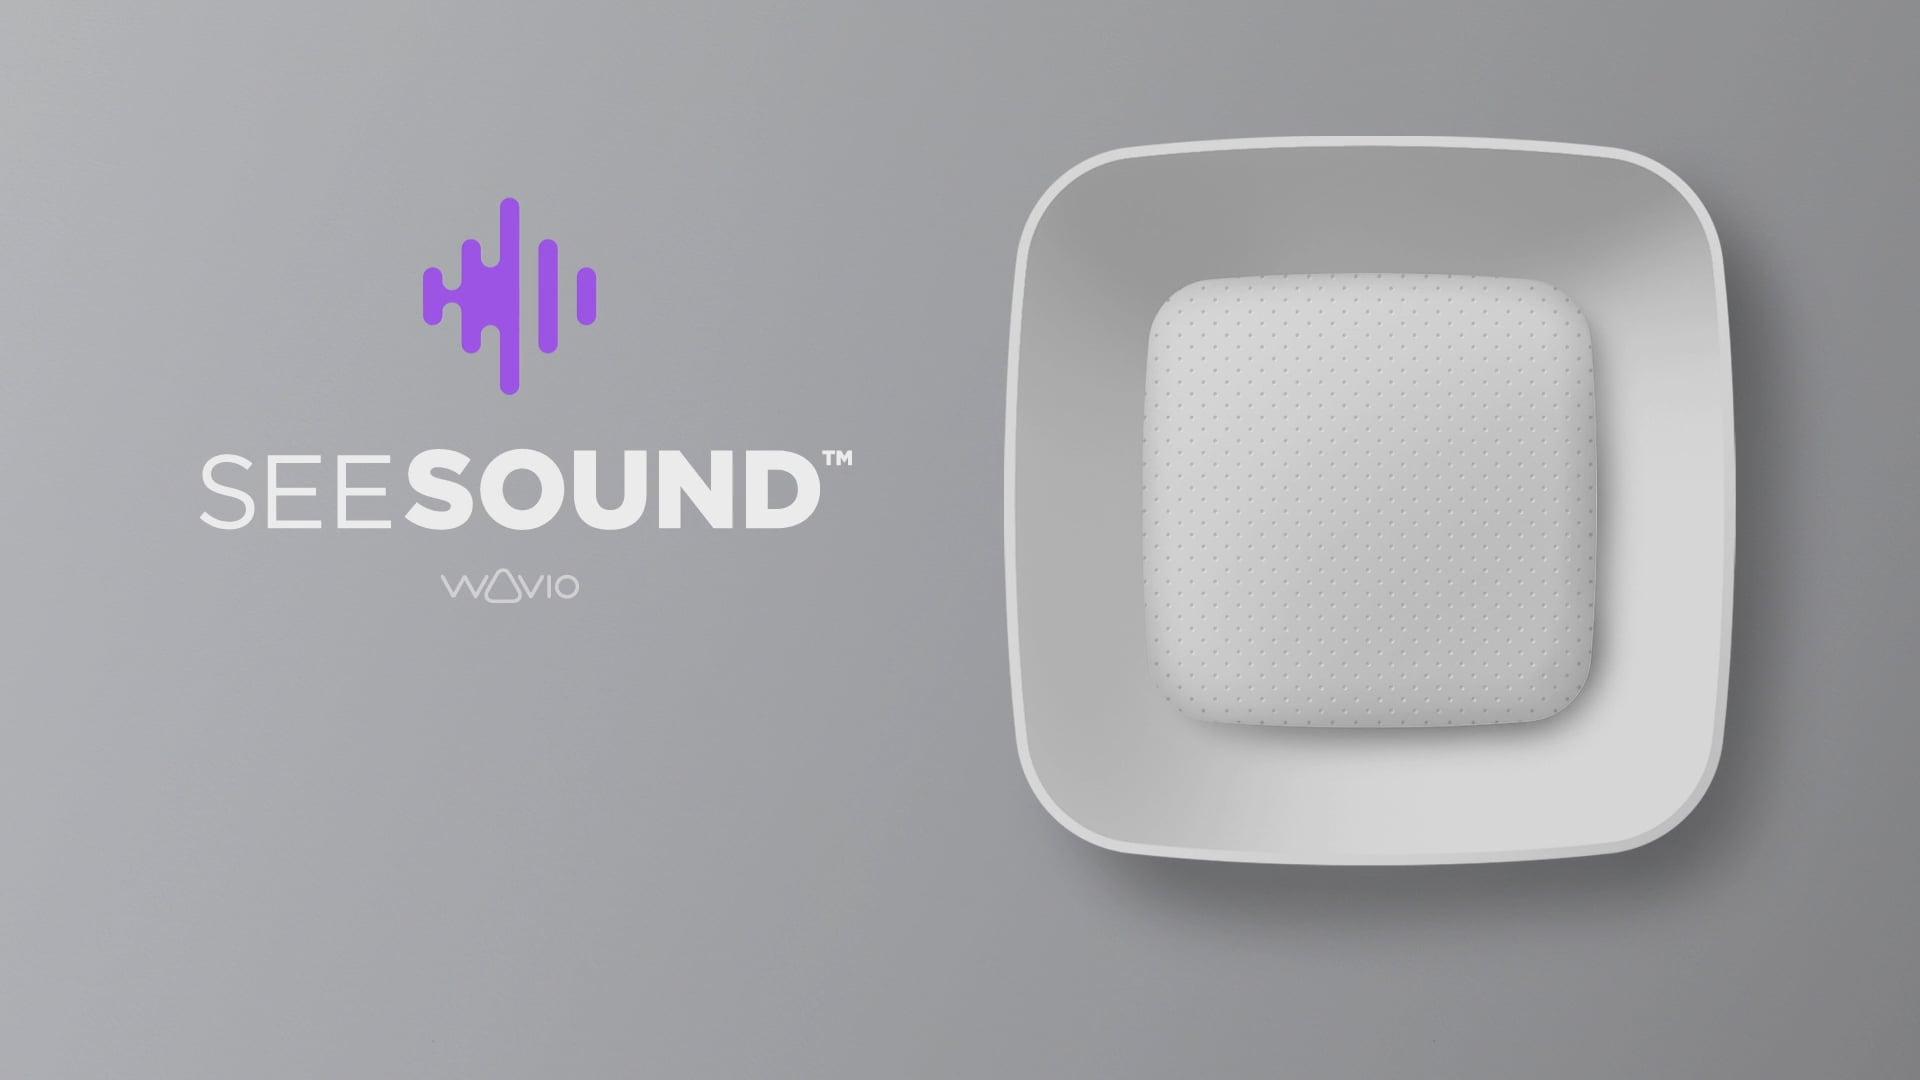 See Sound